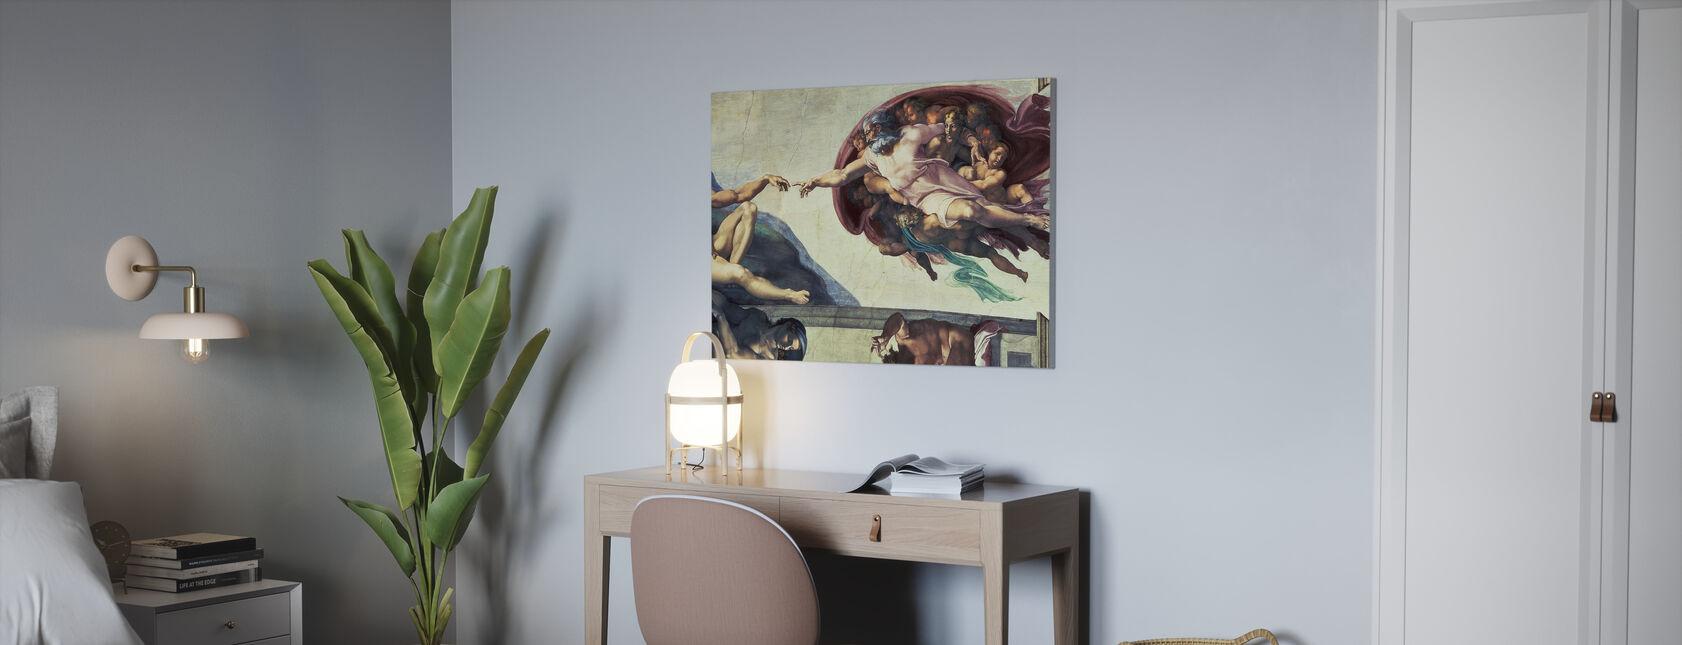 Creation of Adam - Michelangelo Buonarroti - Canvas print - Office